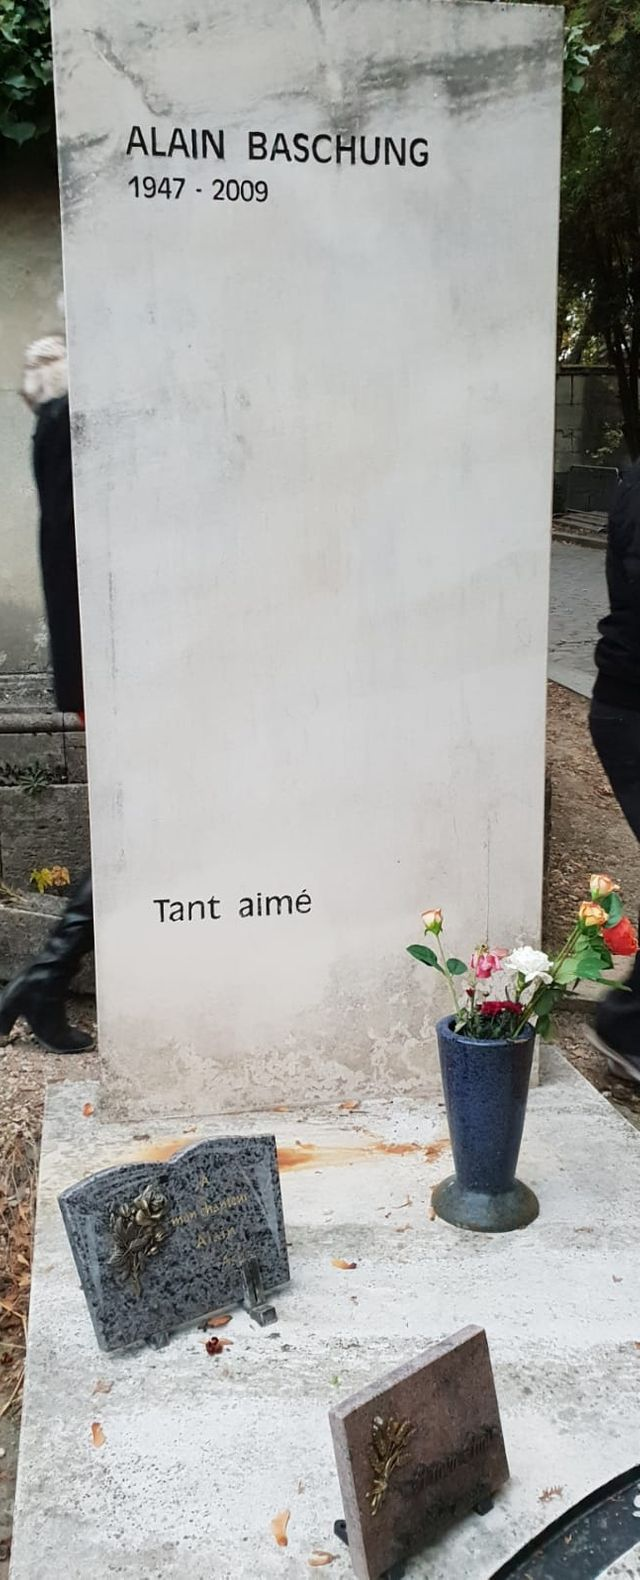 Tombe d'Alain Bashung